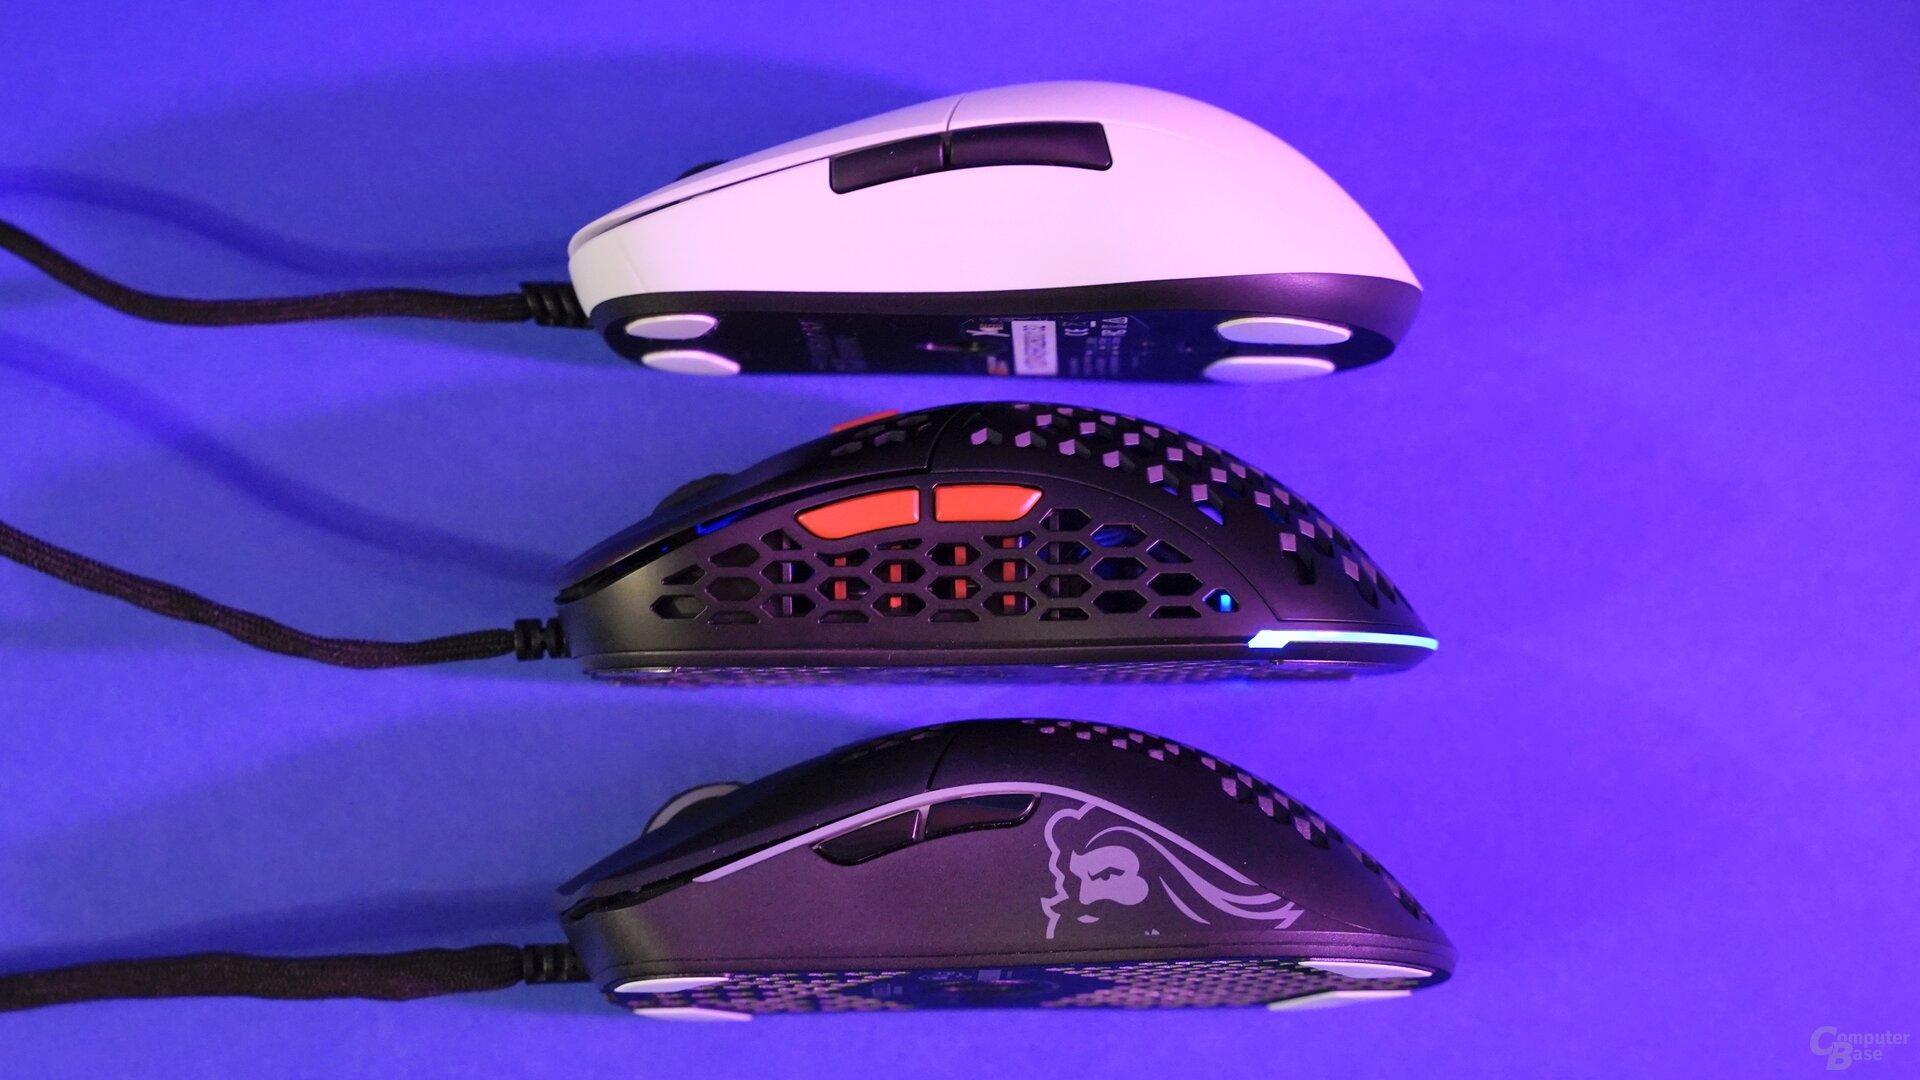 Endgame Gear XM1, SPC Gear LIX Plus & Glorious Model O